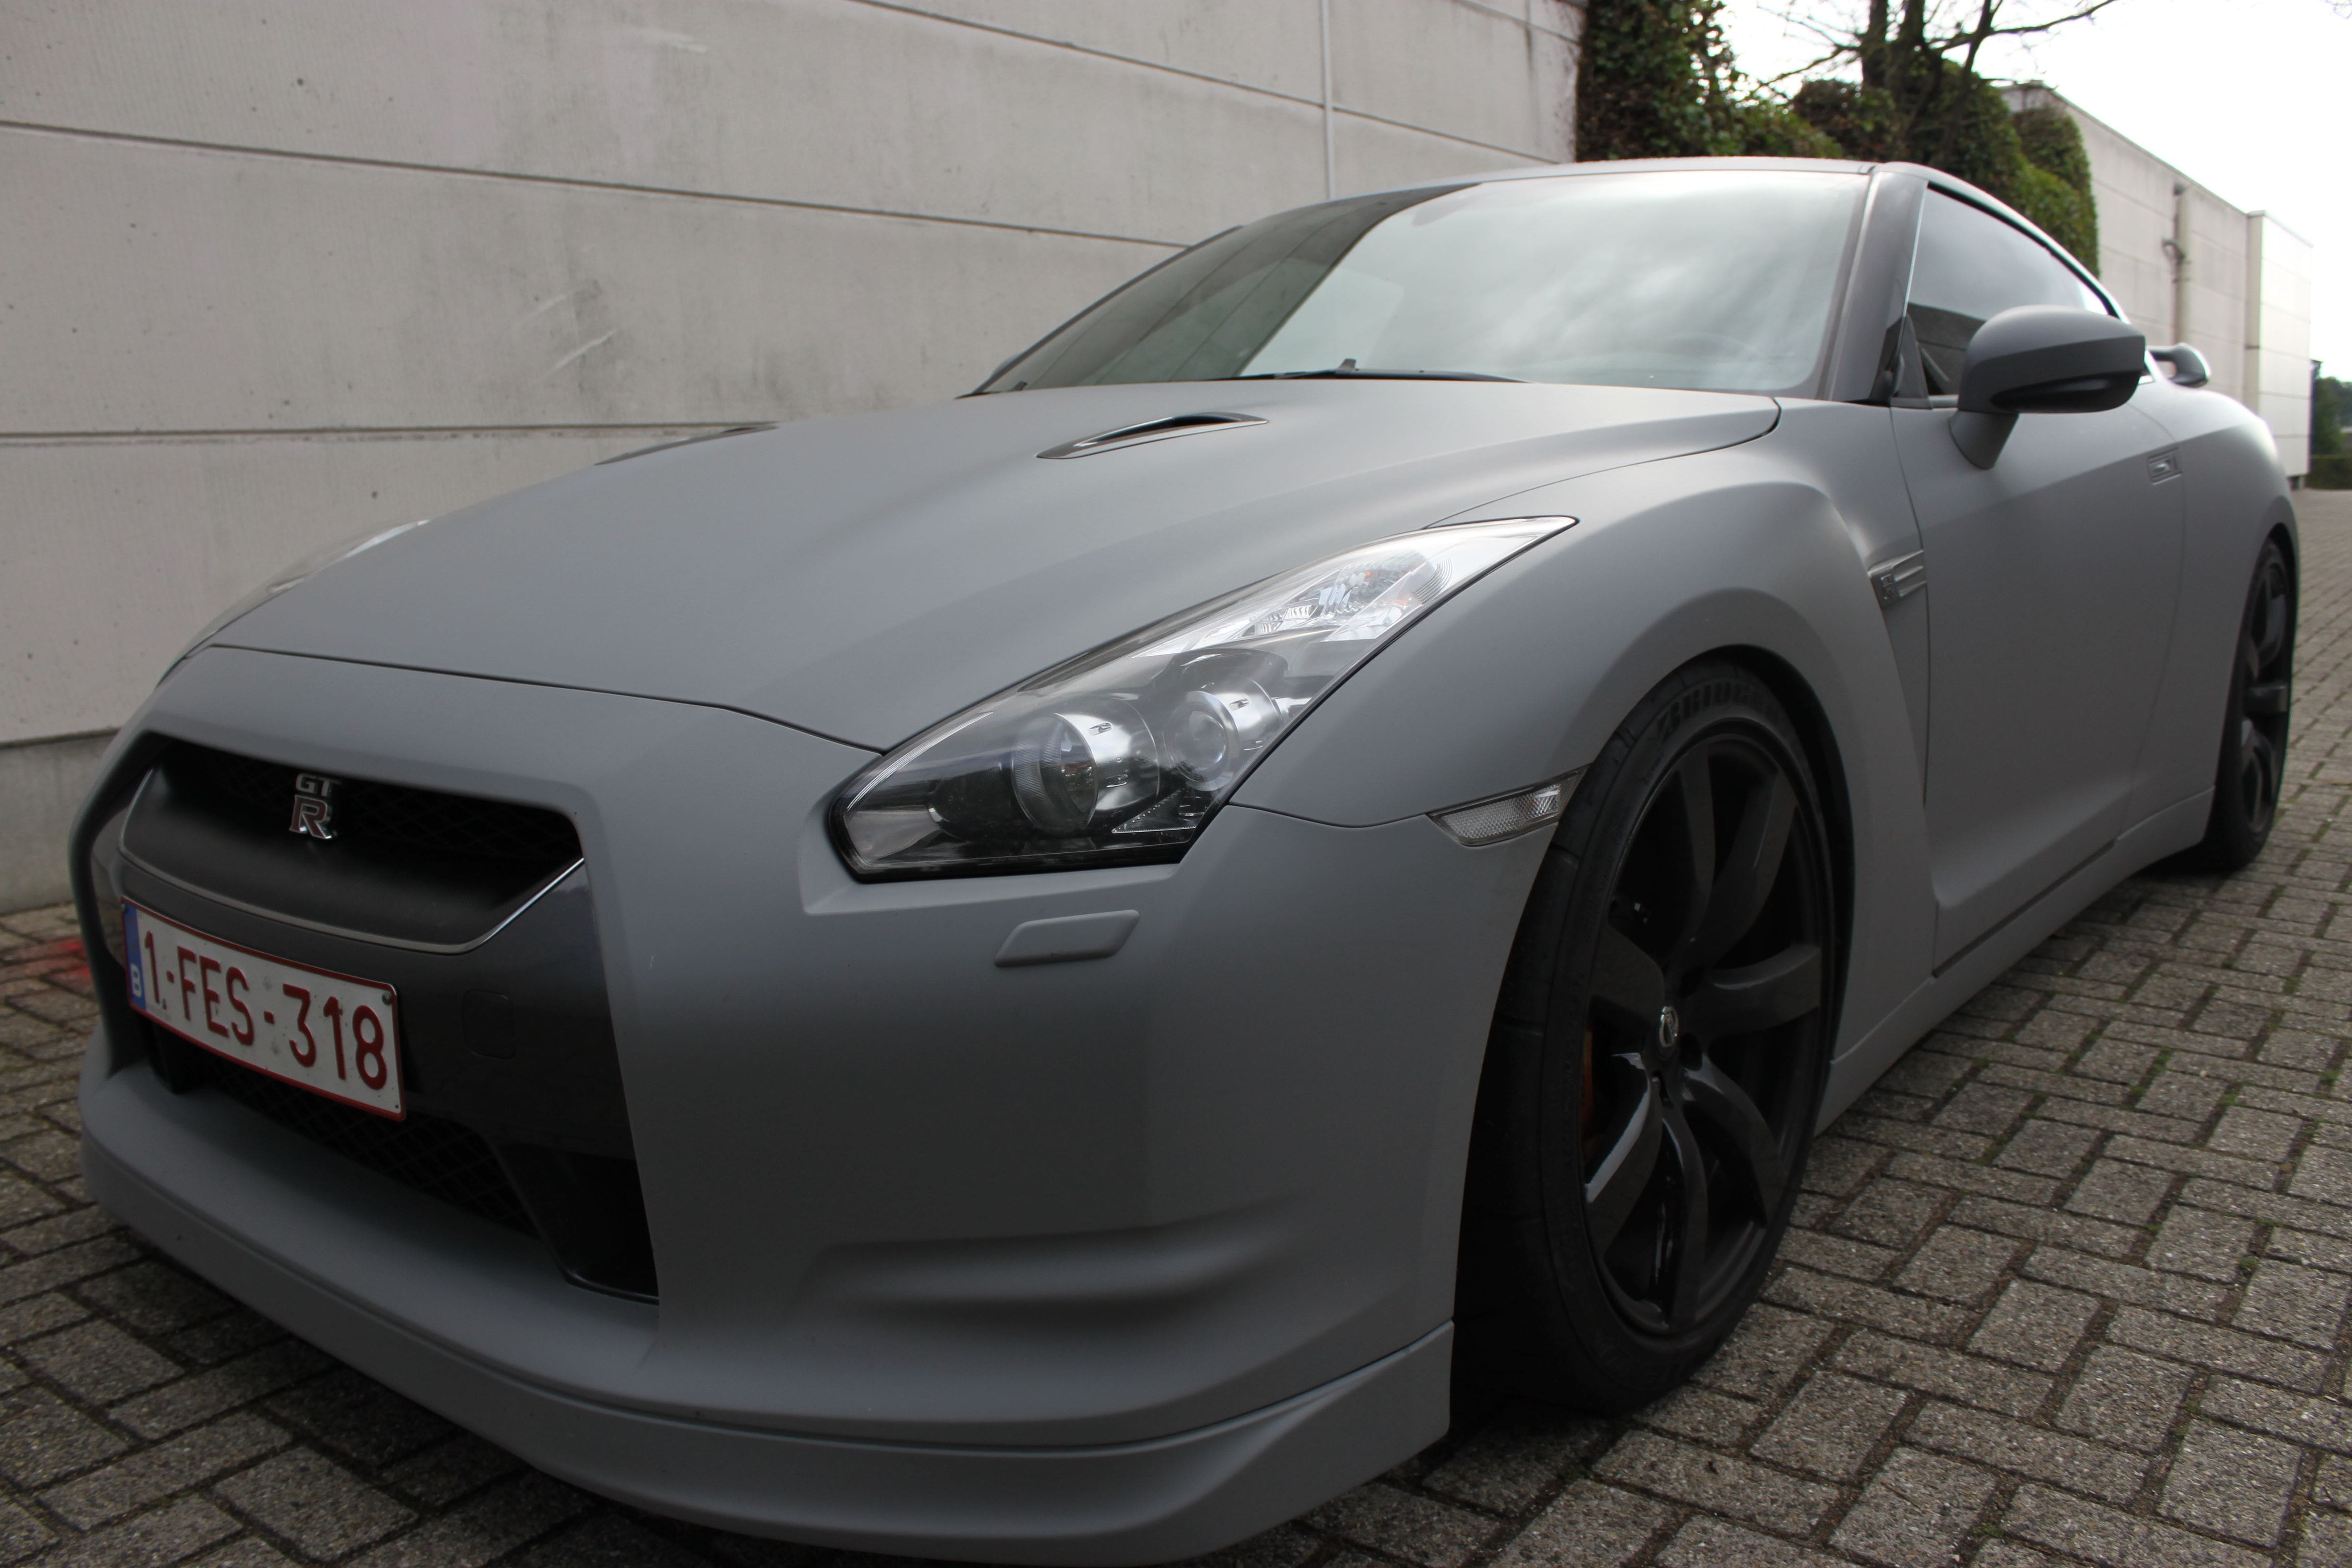 Nissan GT-R met Mat Grijze Wrap, Carwrapping door Wrapmyride.nu Foto-nr:6564, ©2020